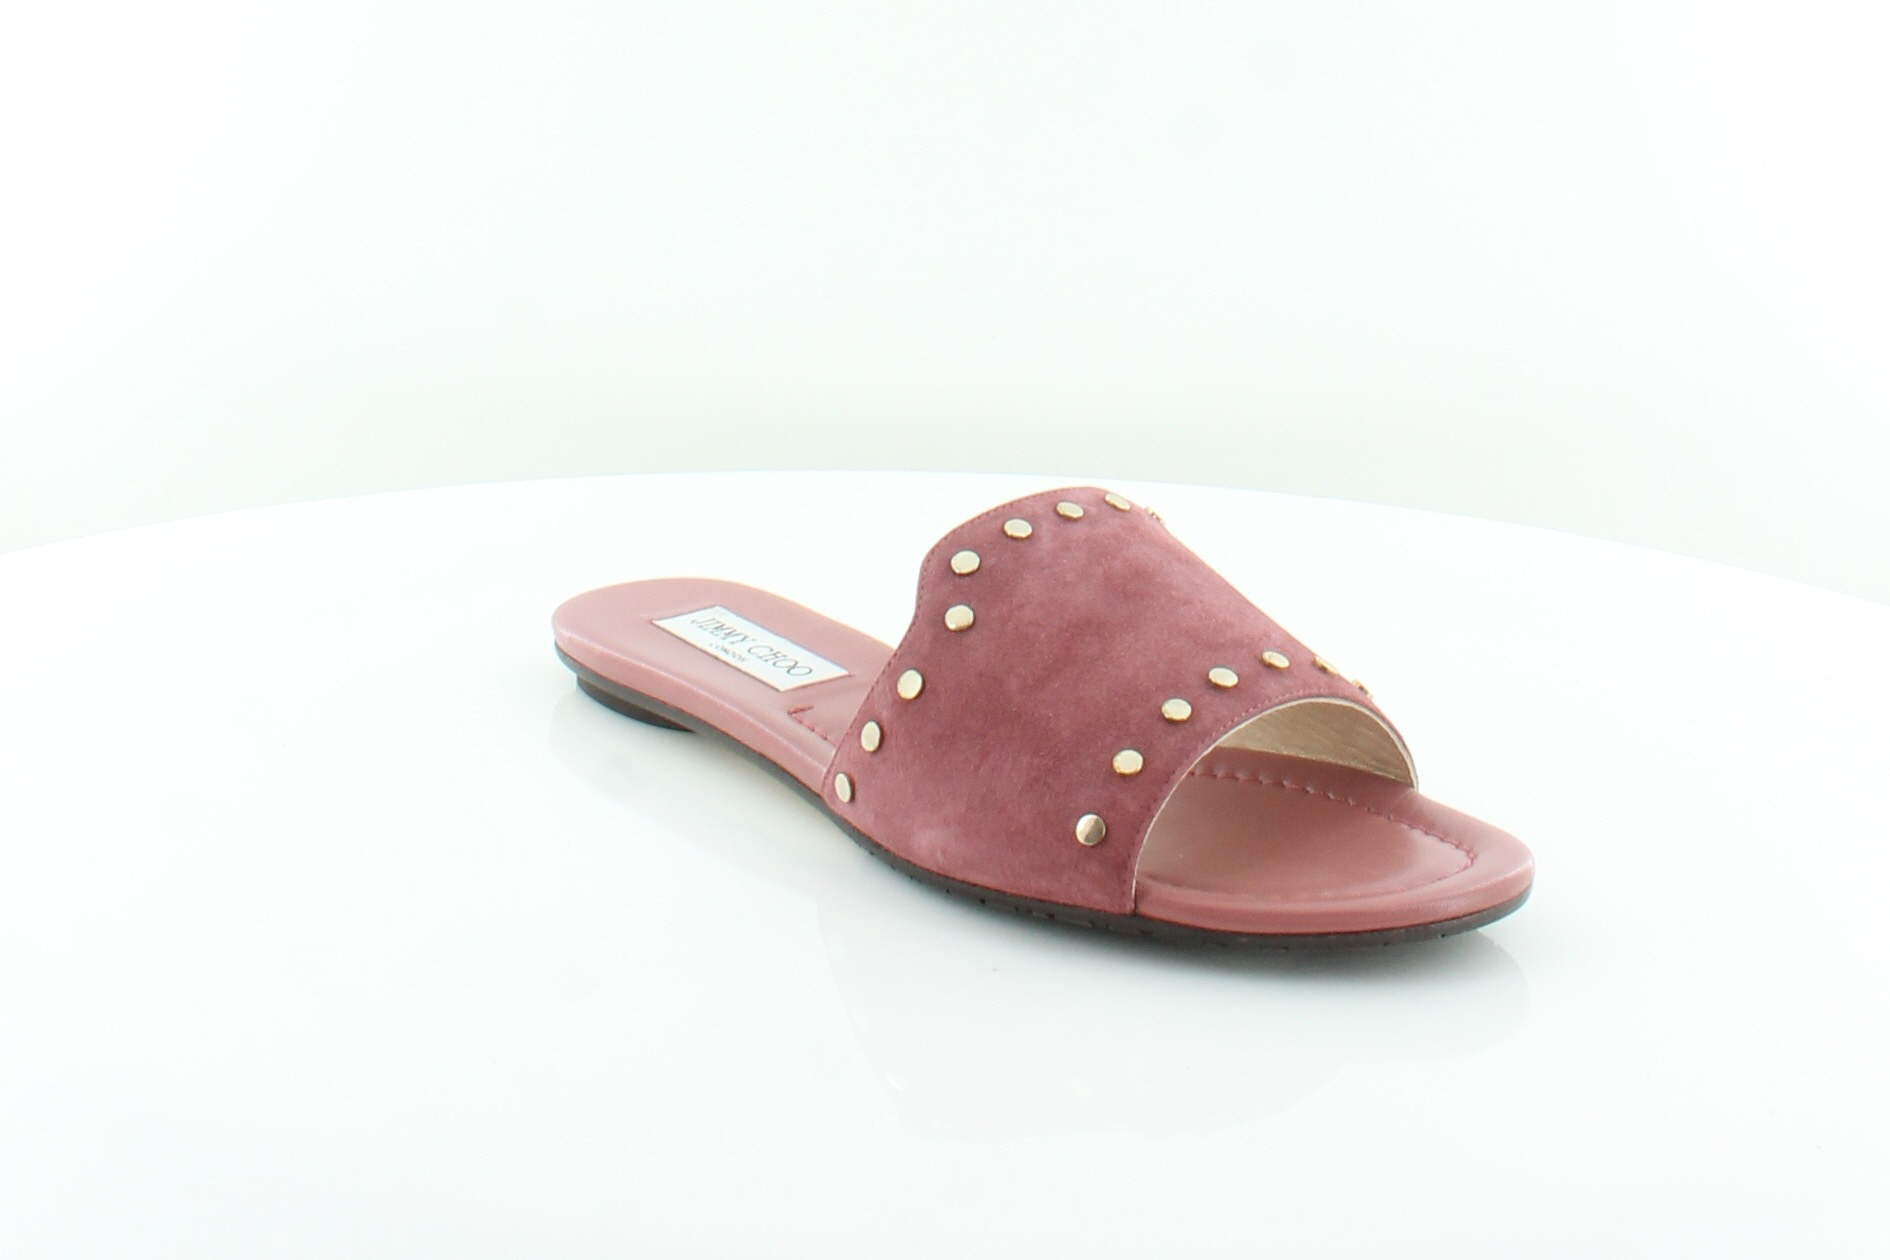 417e47daf6e JIMMY CHOO Nanda Women s Sandals Vintage Rose Gold